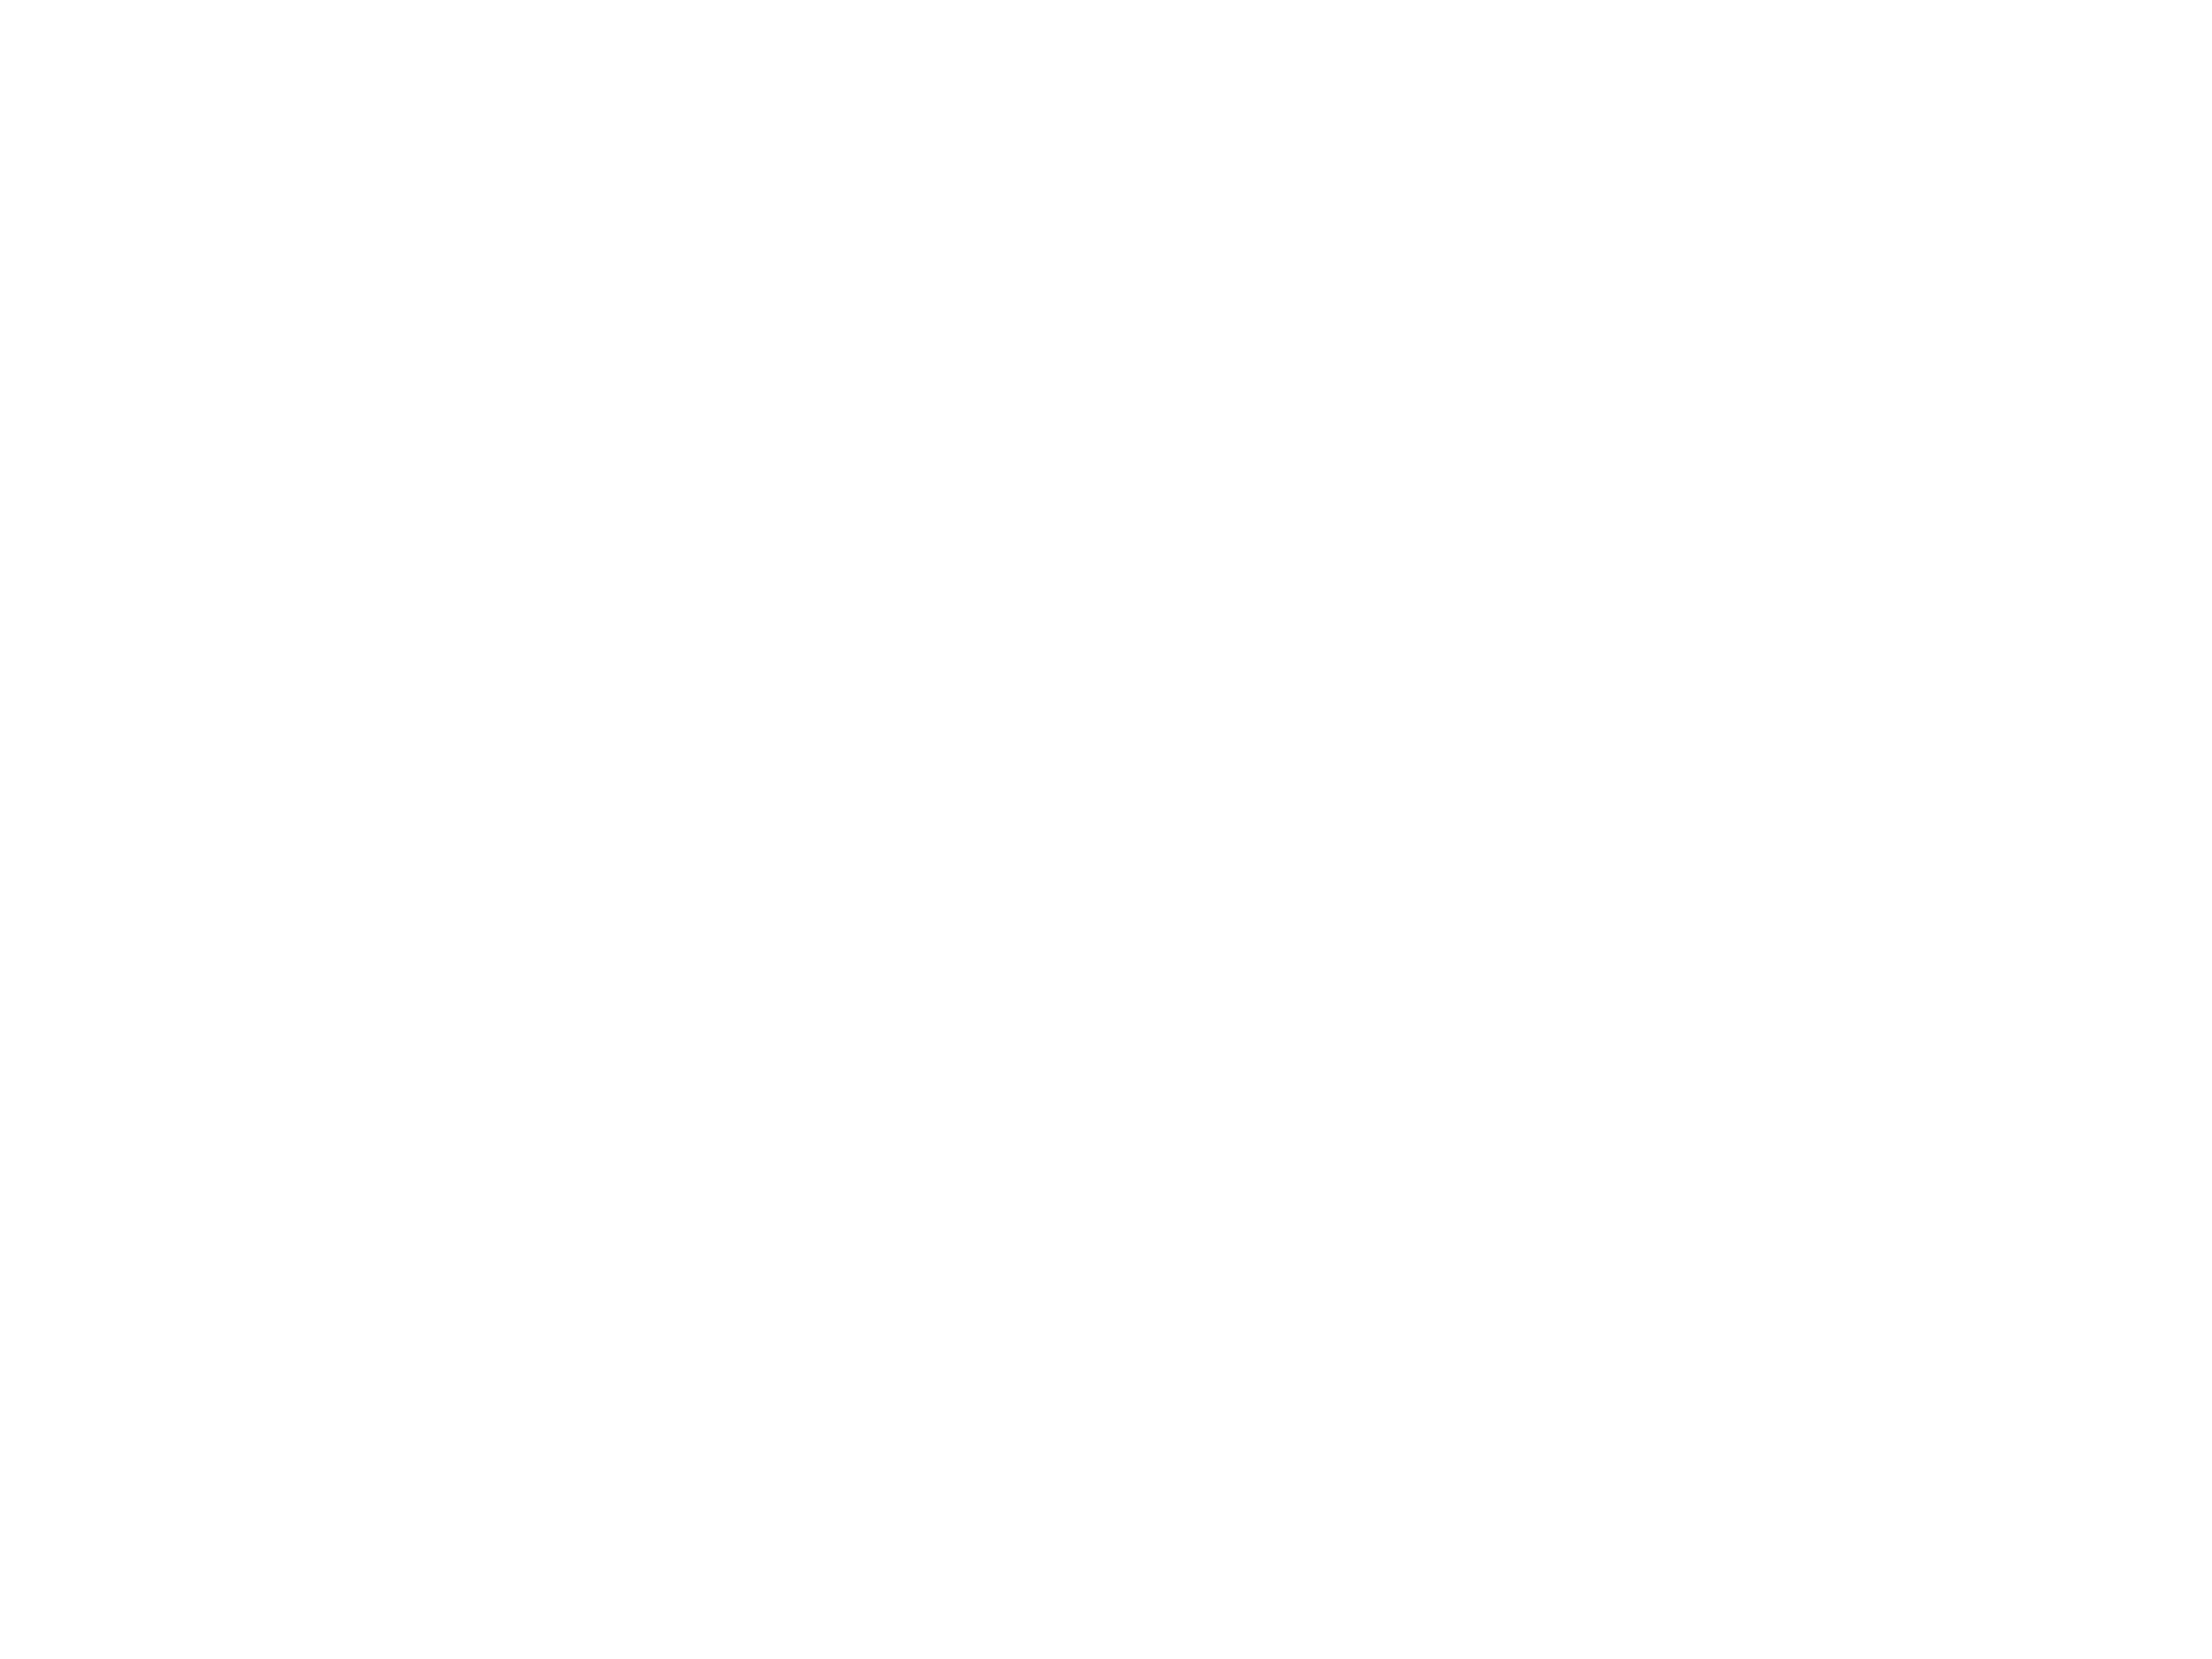 img_1516